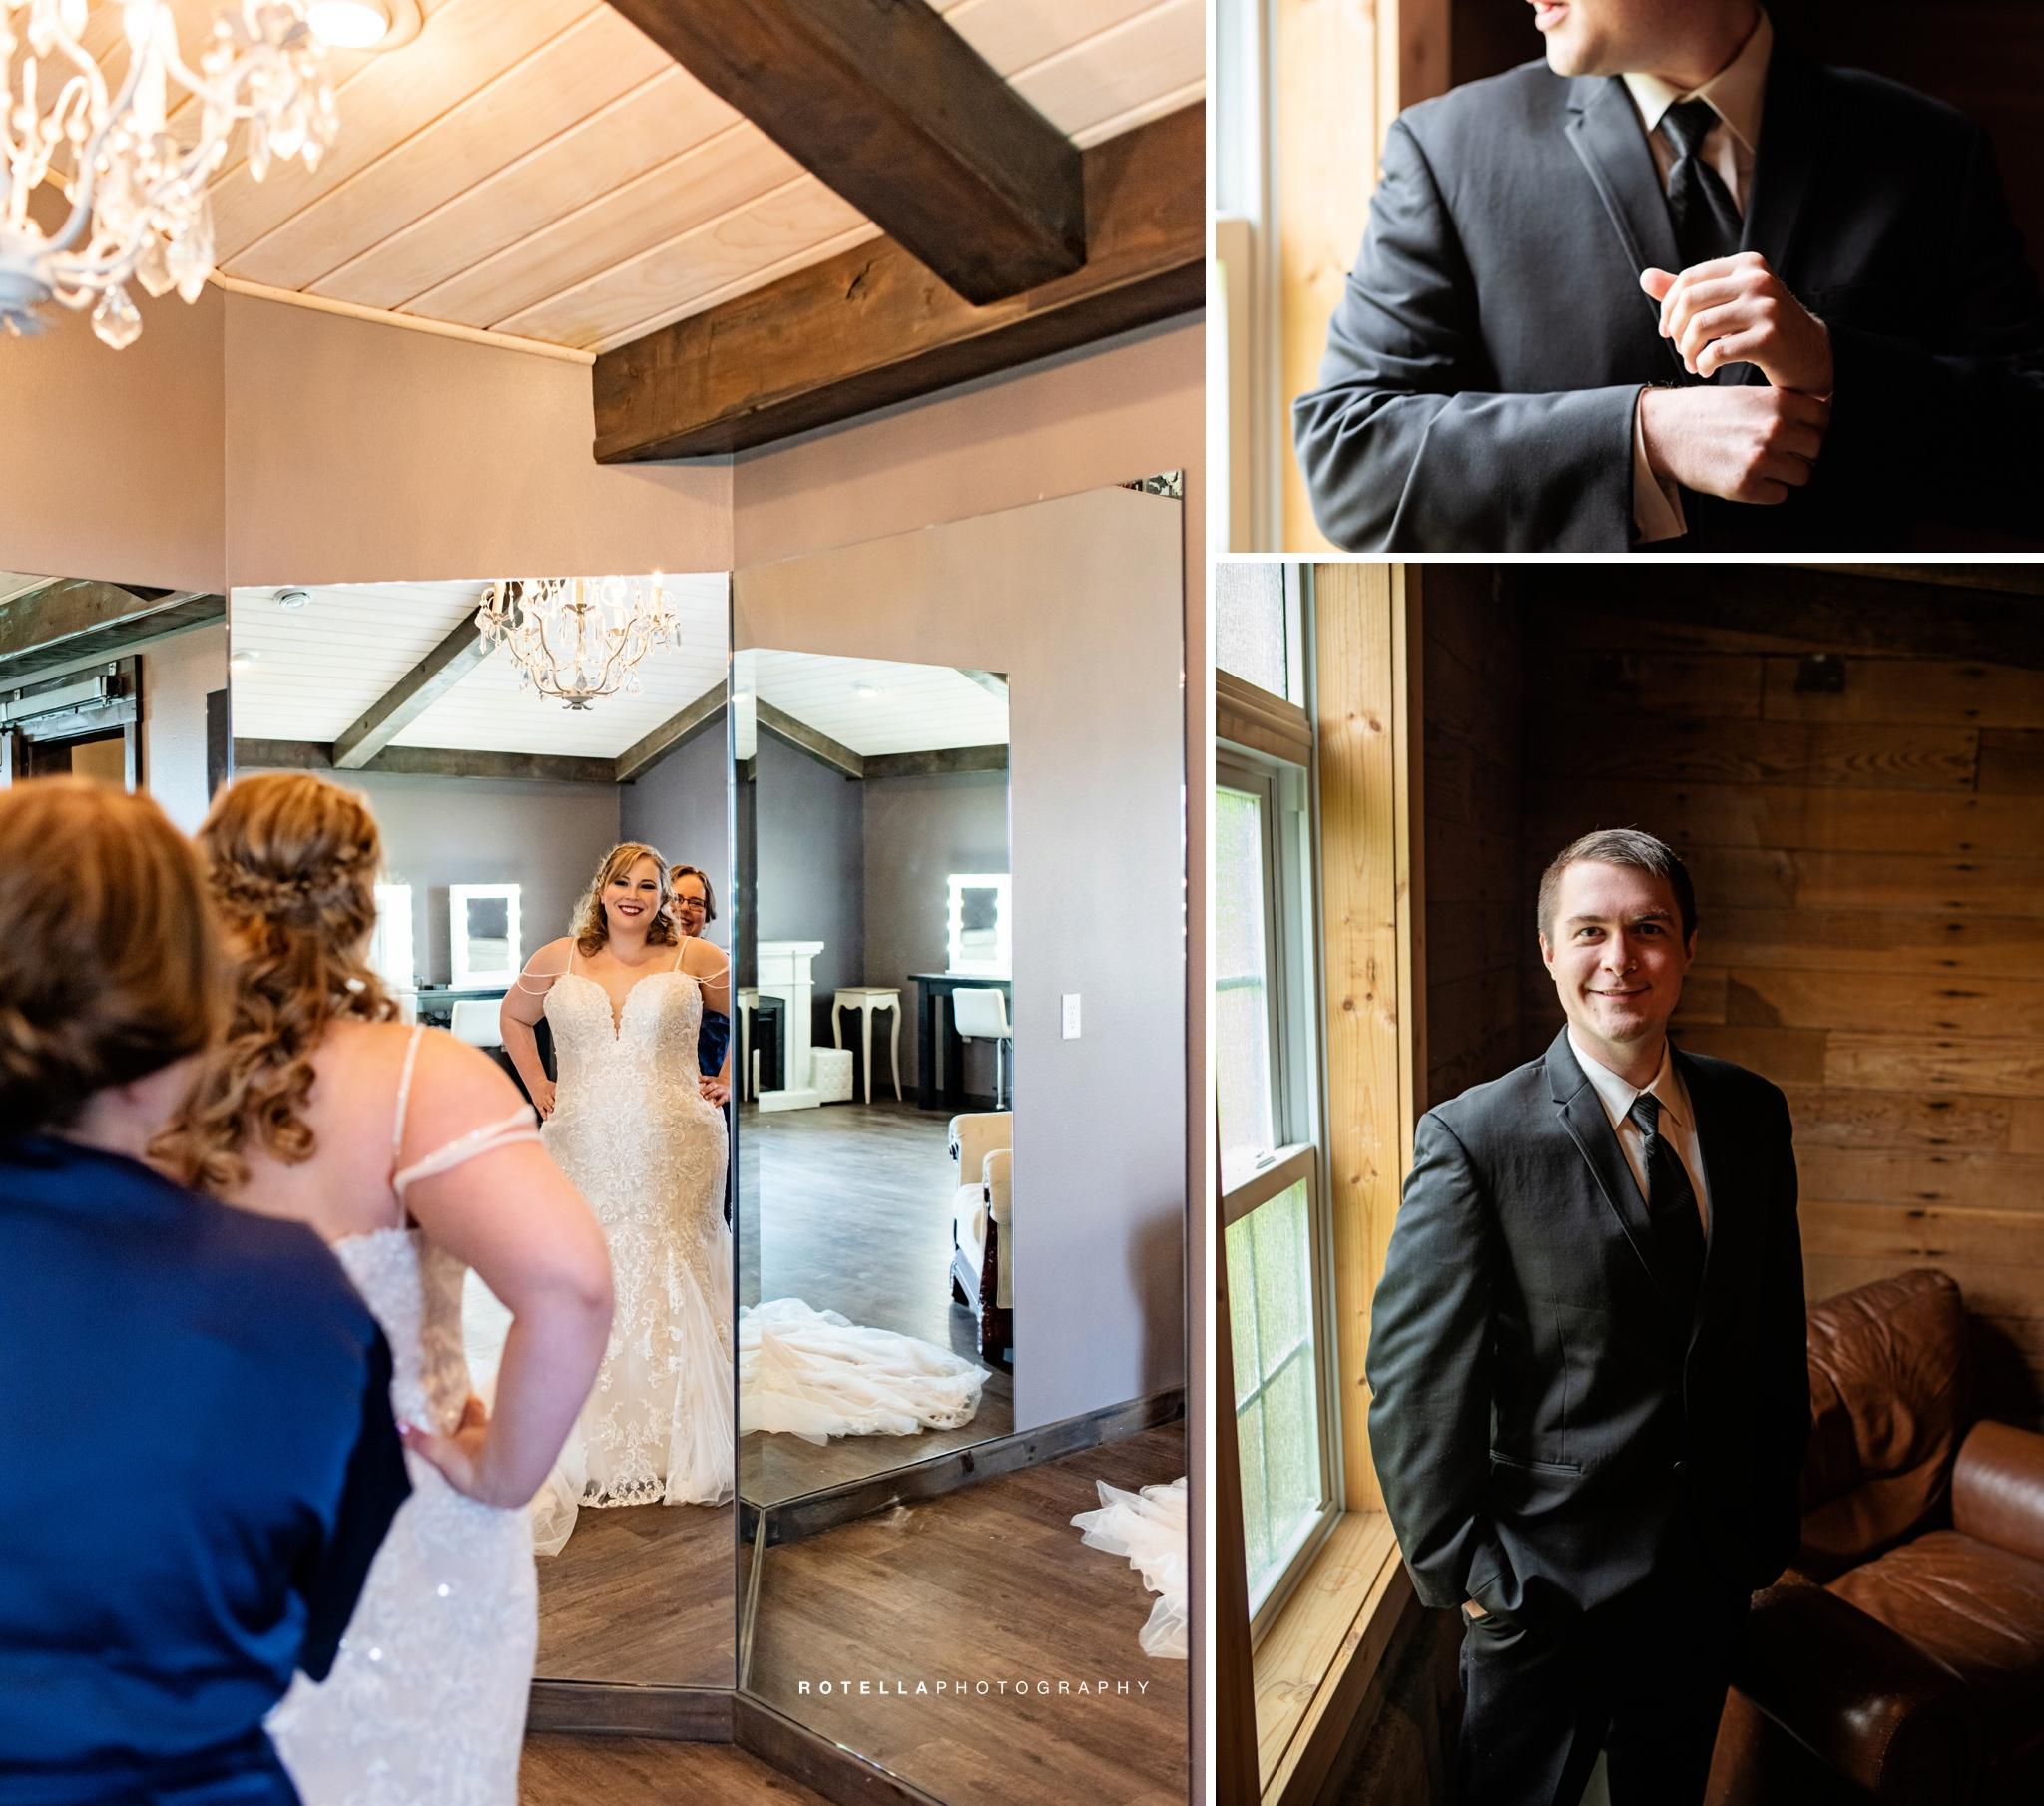 Cassie-Corbin-Wedding-05-25-2019-Rotella-Photography-PREV-97-92_BLOG.jpg